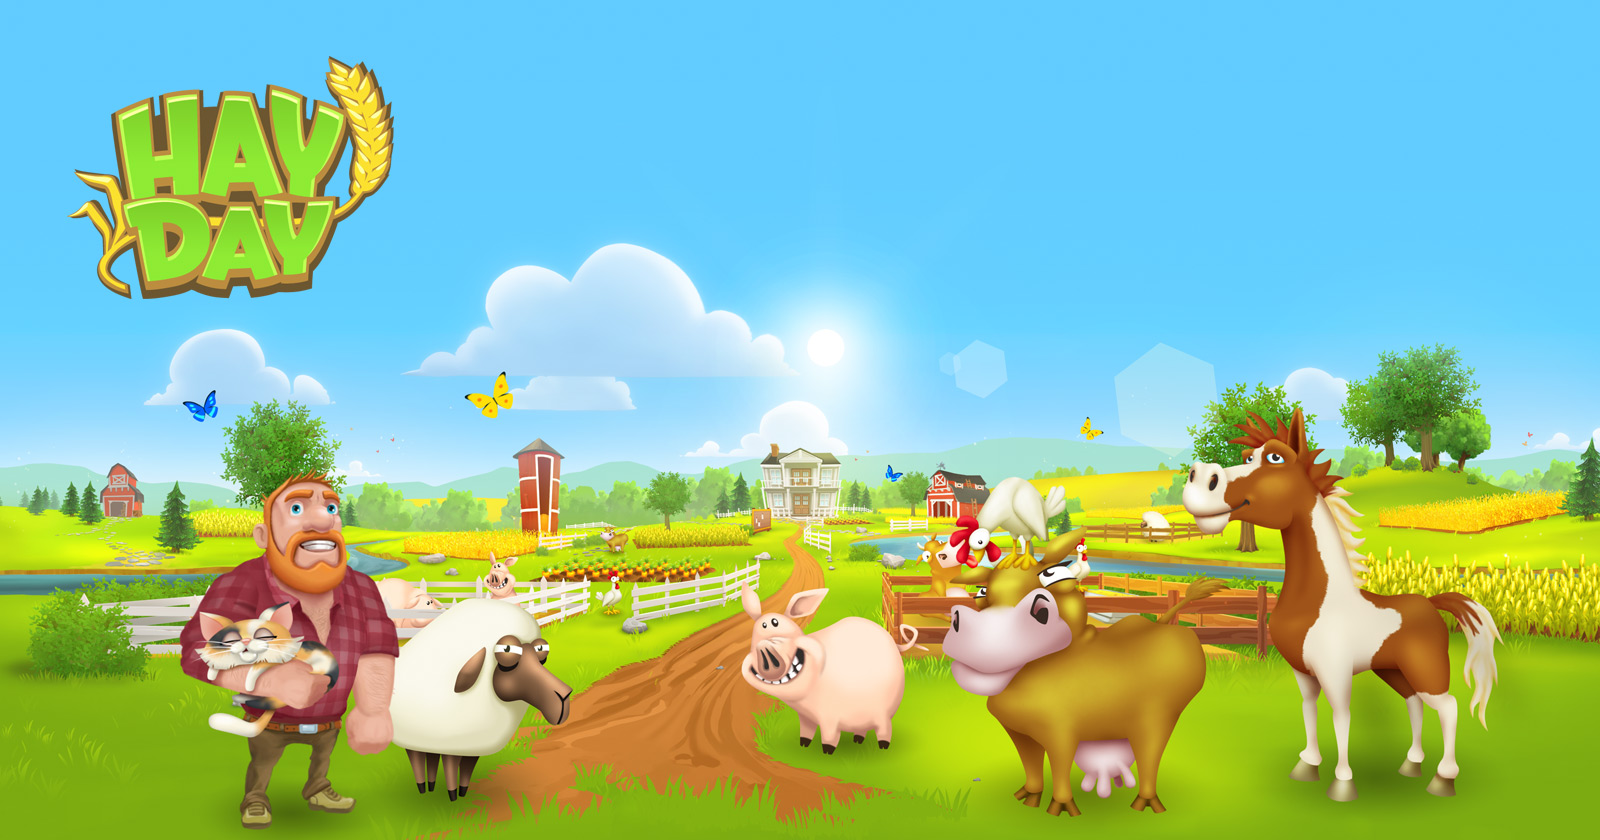 لعبة هاي داي تنزيل سريع - Hay Day